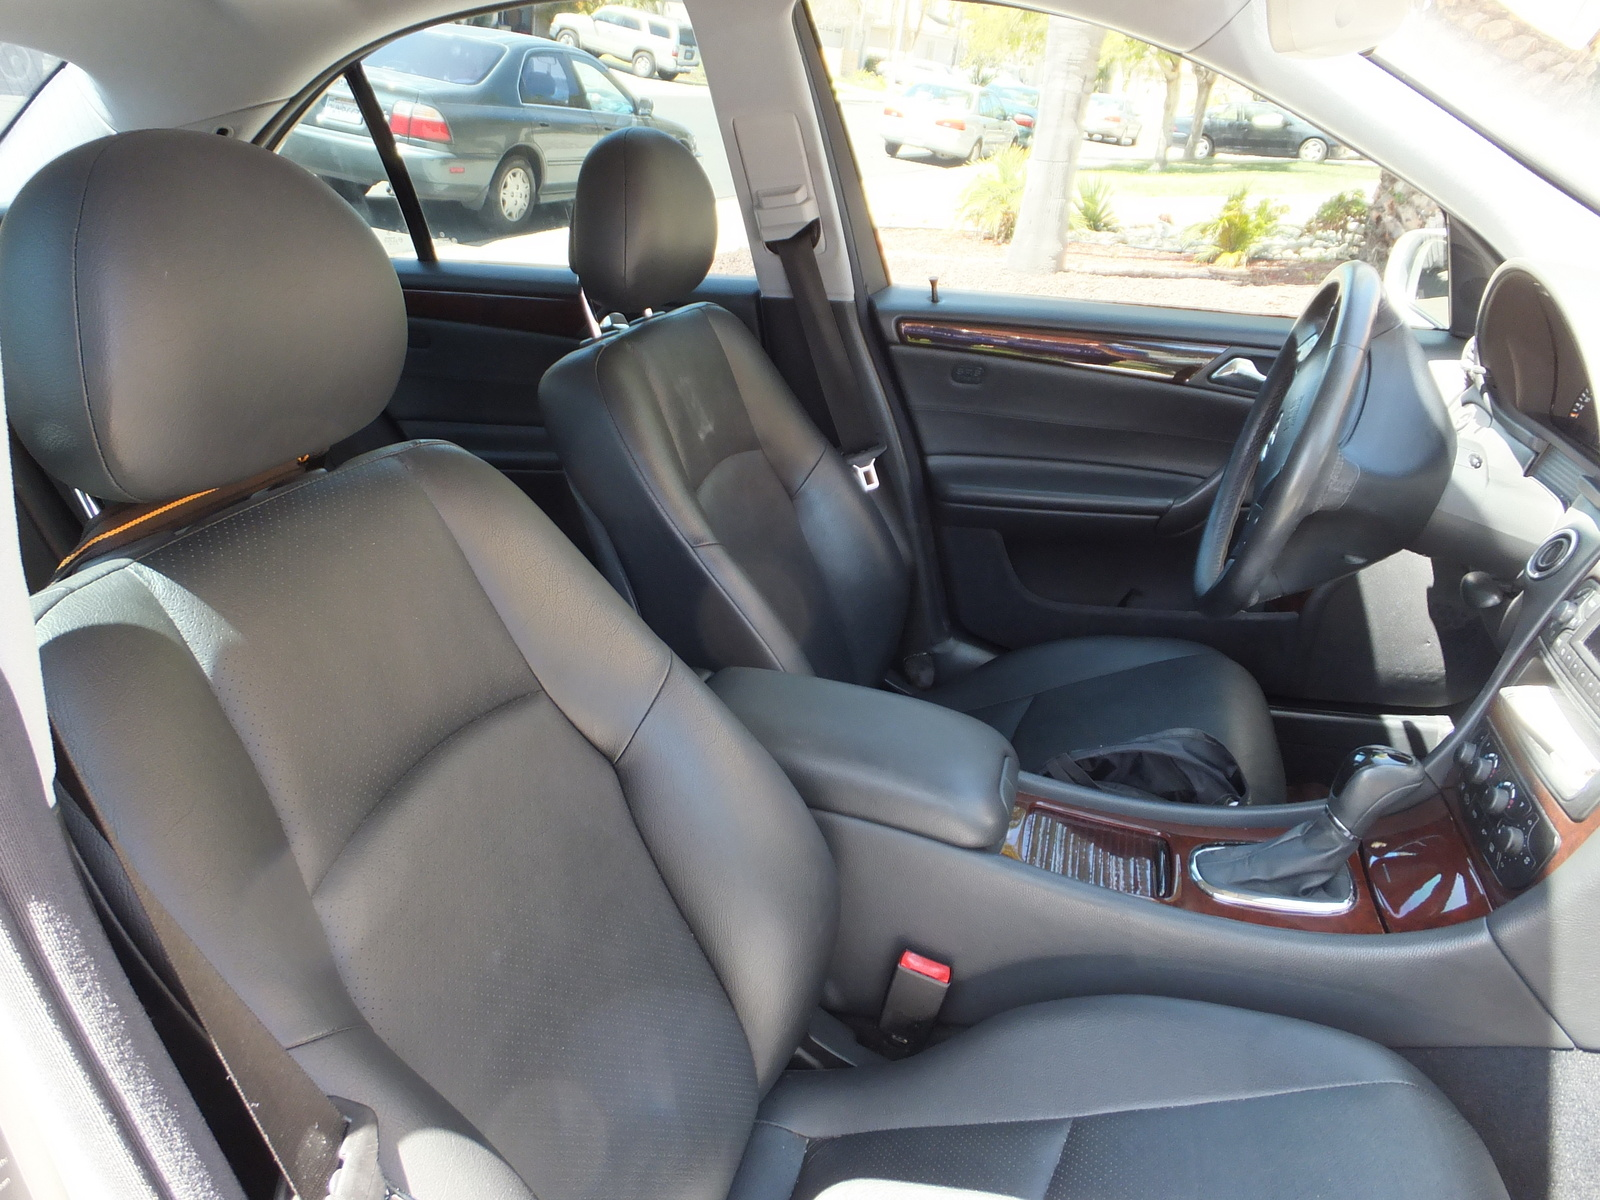 Mercedes Benz 2003 C240 Specs Picture of 2003 Mercedes-benz